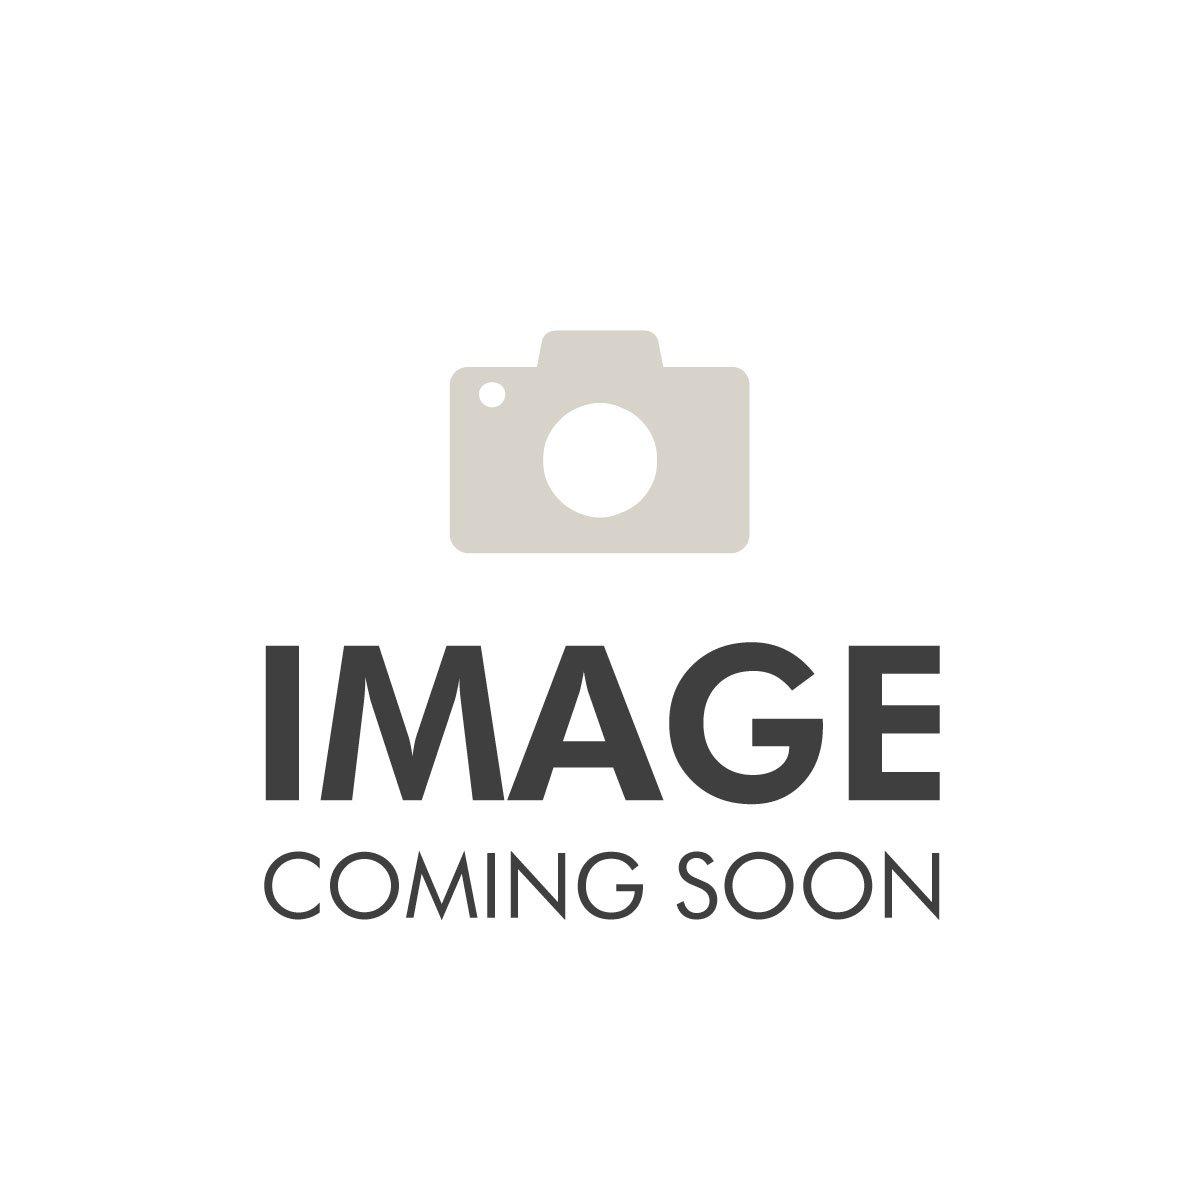 L'Oreal Loreal Men Expert Hydra Power 50ml